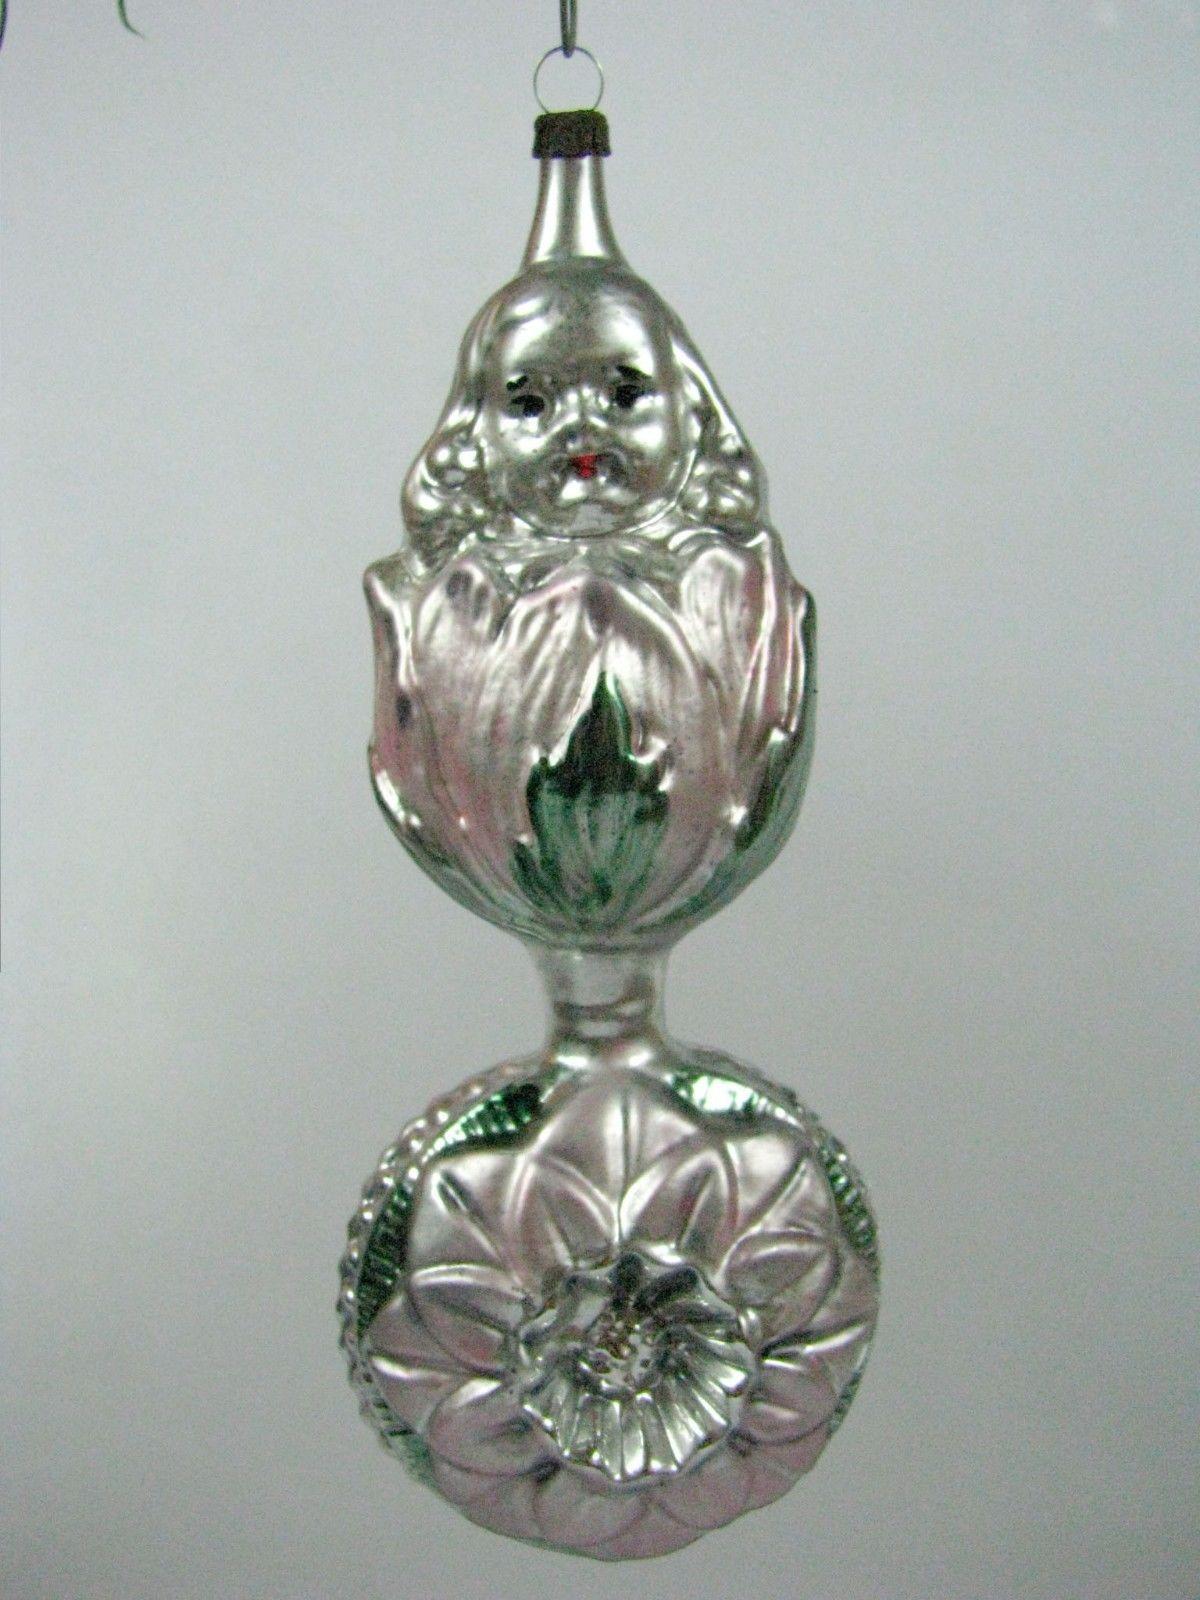 Vintage Girl in Tulip on Indent Ball German Mercury Glass Christmas Ornament | eBay